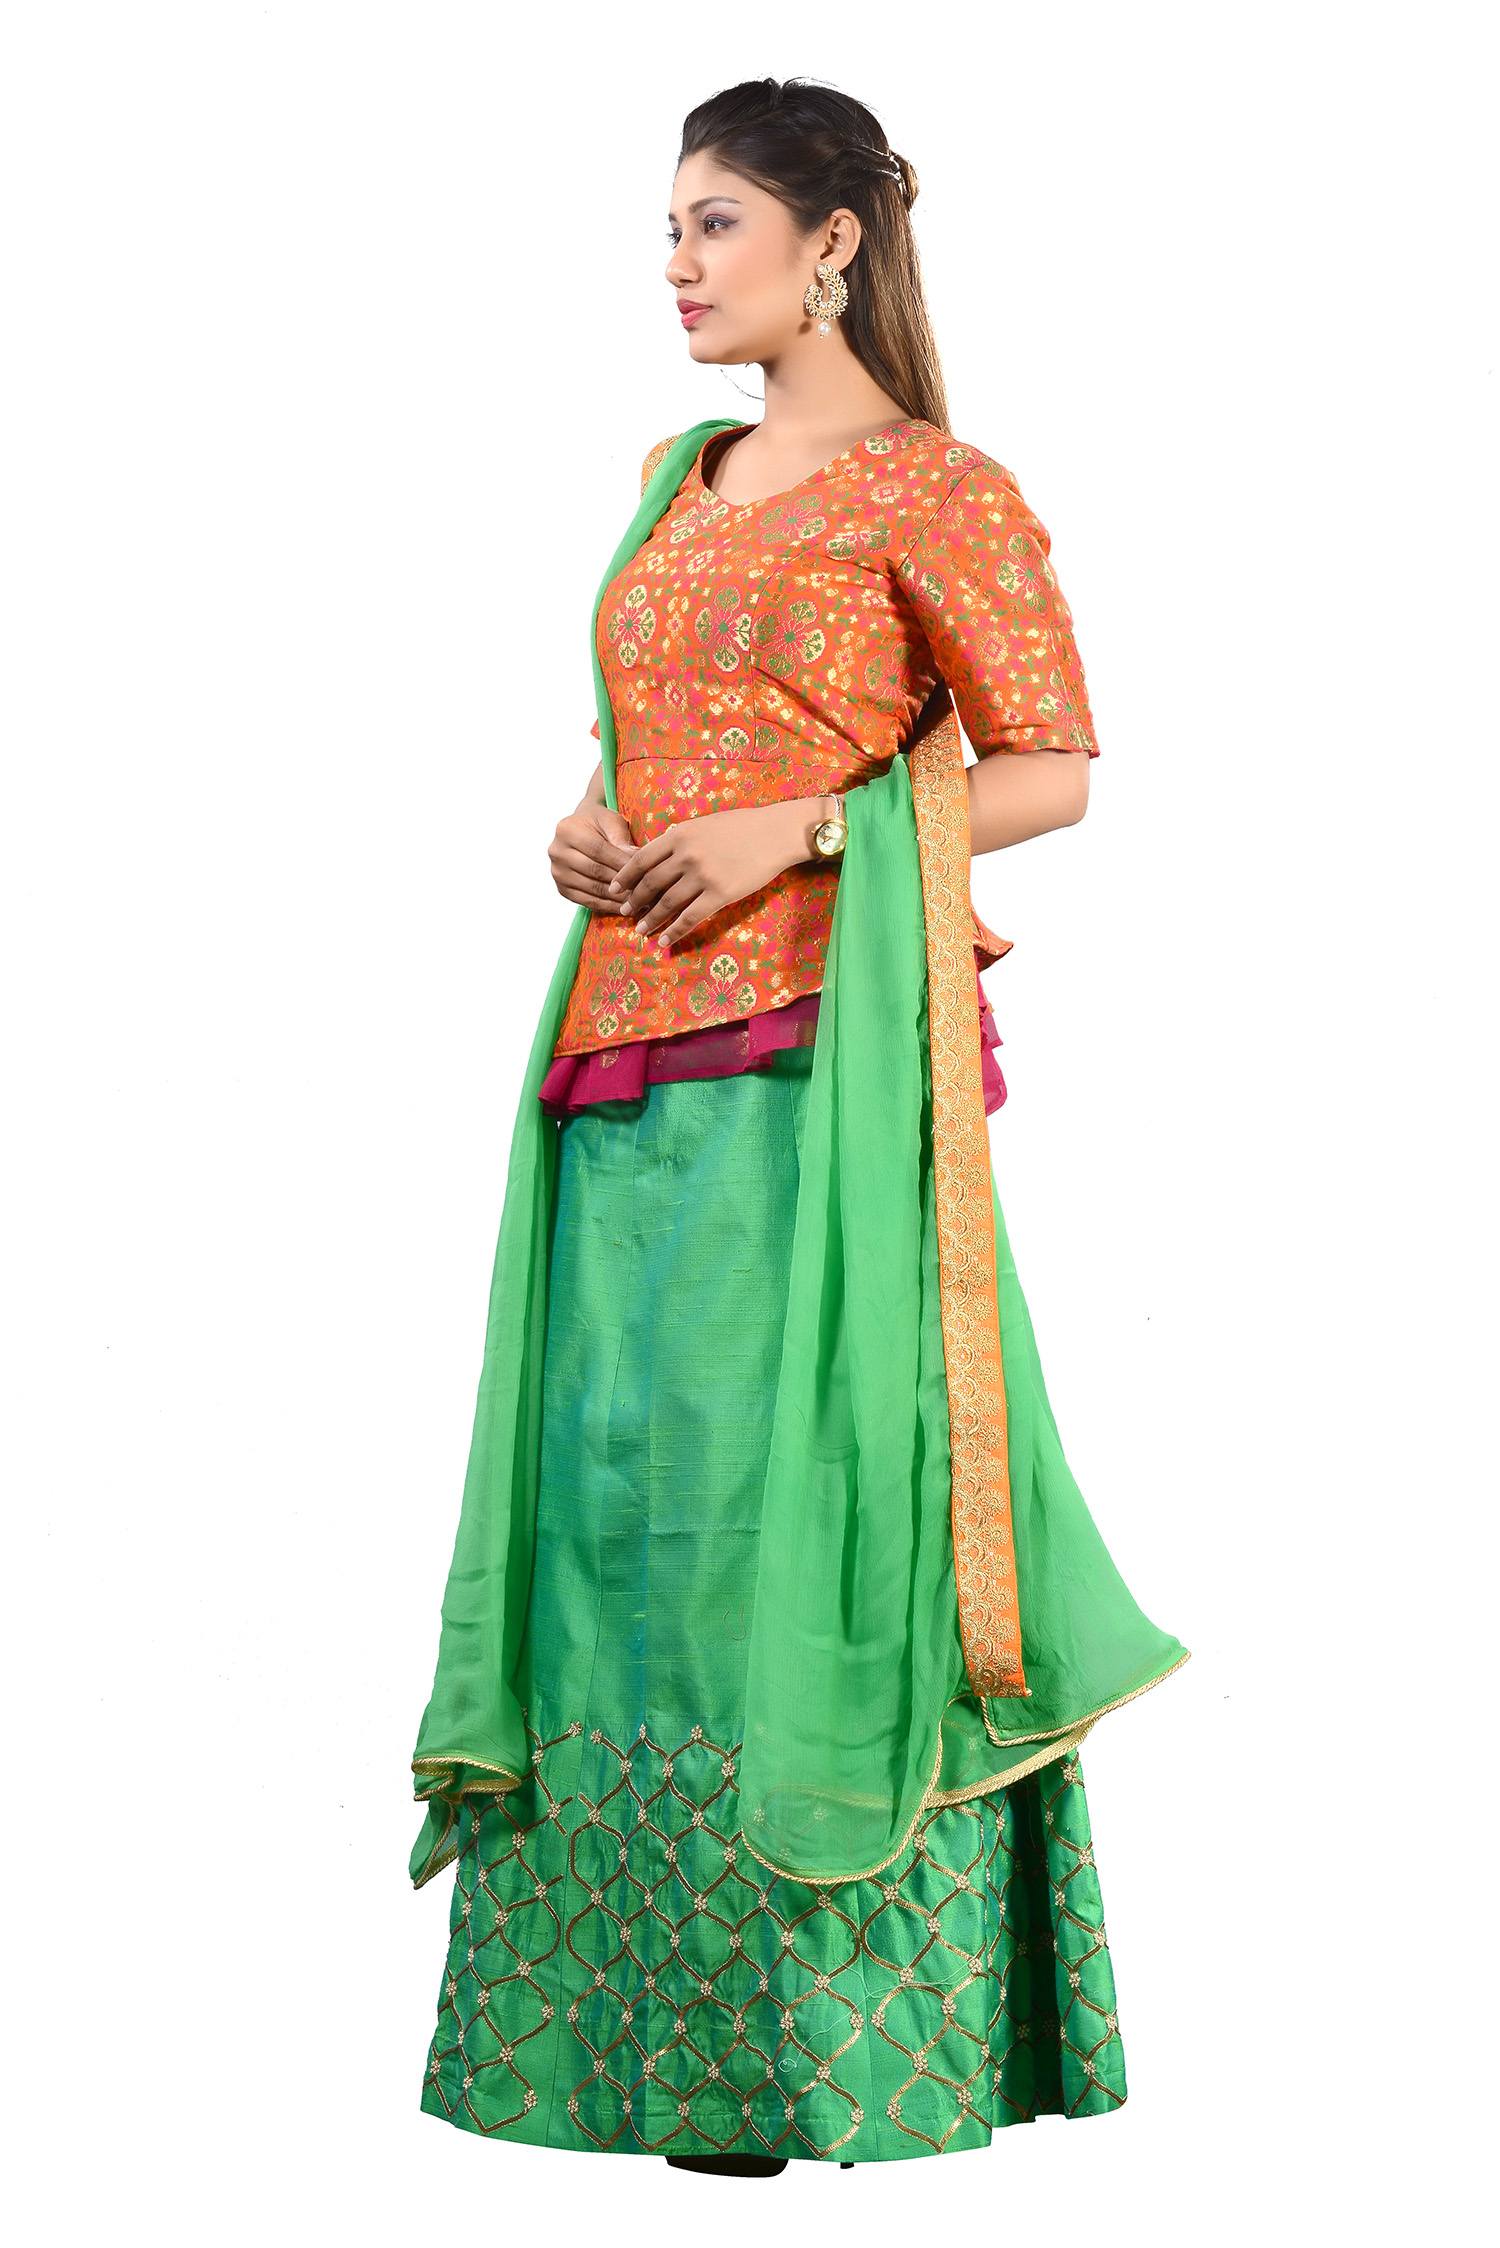 f1768f837915f Orange Banarasi Peplum Top With Hand Embroidered Skirt And Dupatta